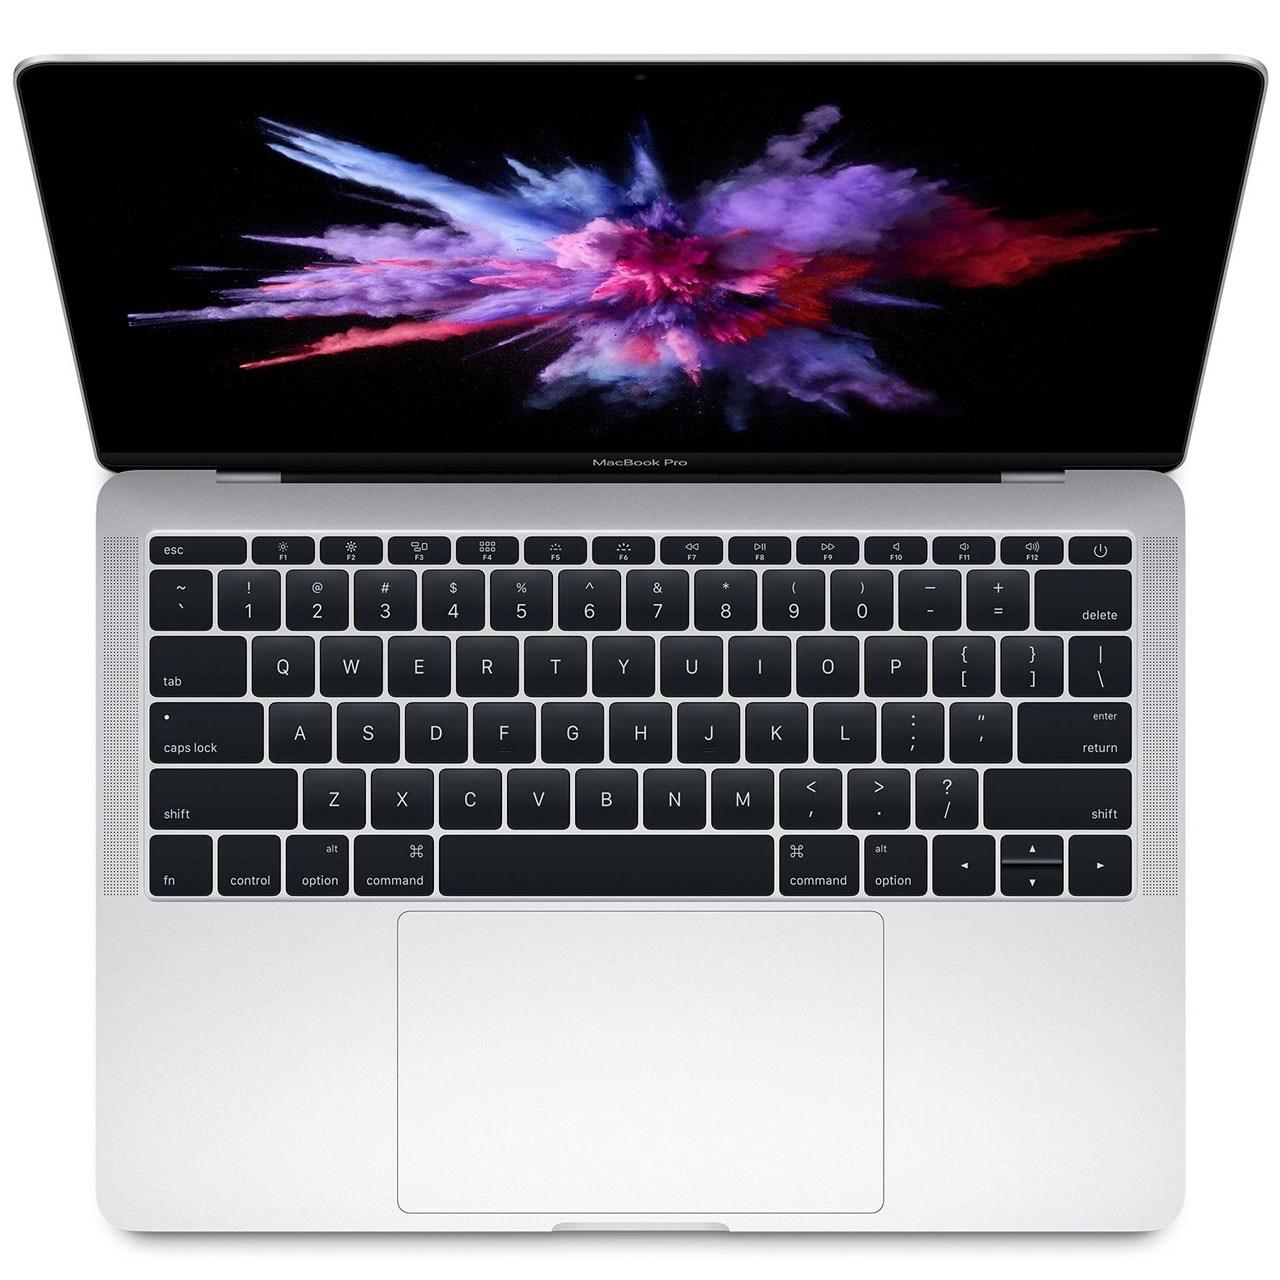 لپ تاپ 13 اینچی اپل مدل MacBook Pro MPXU2 2017